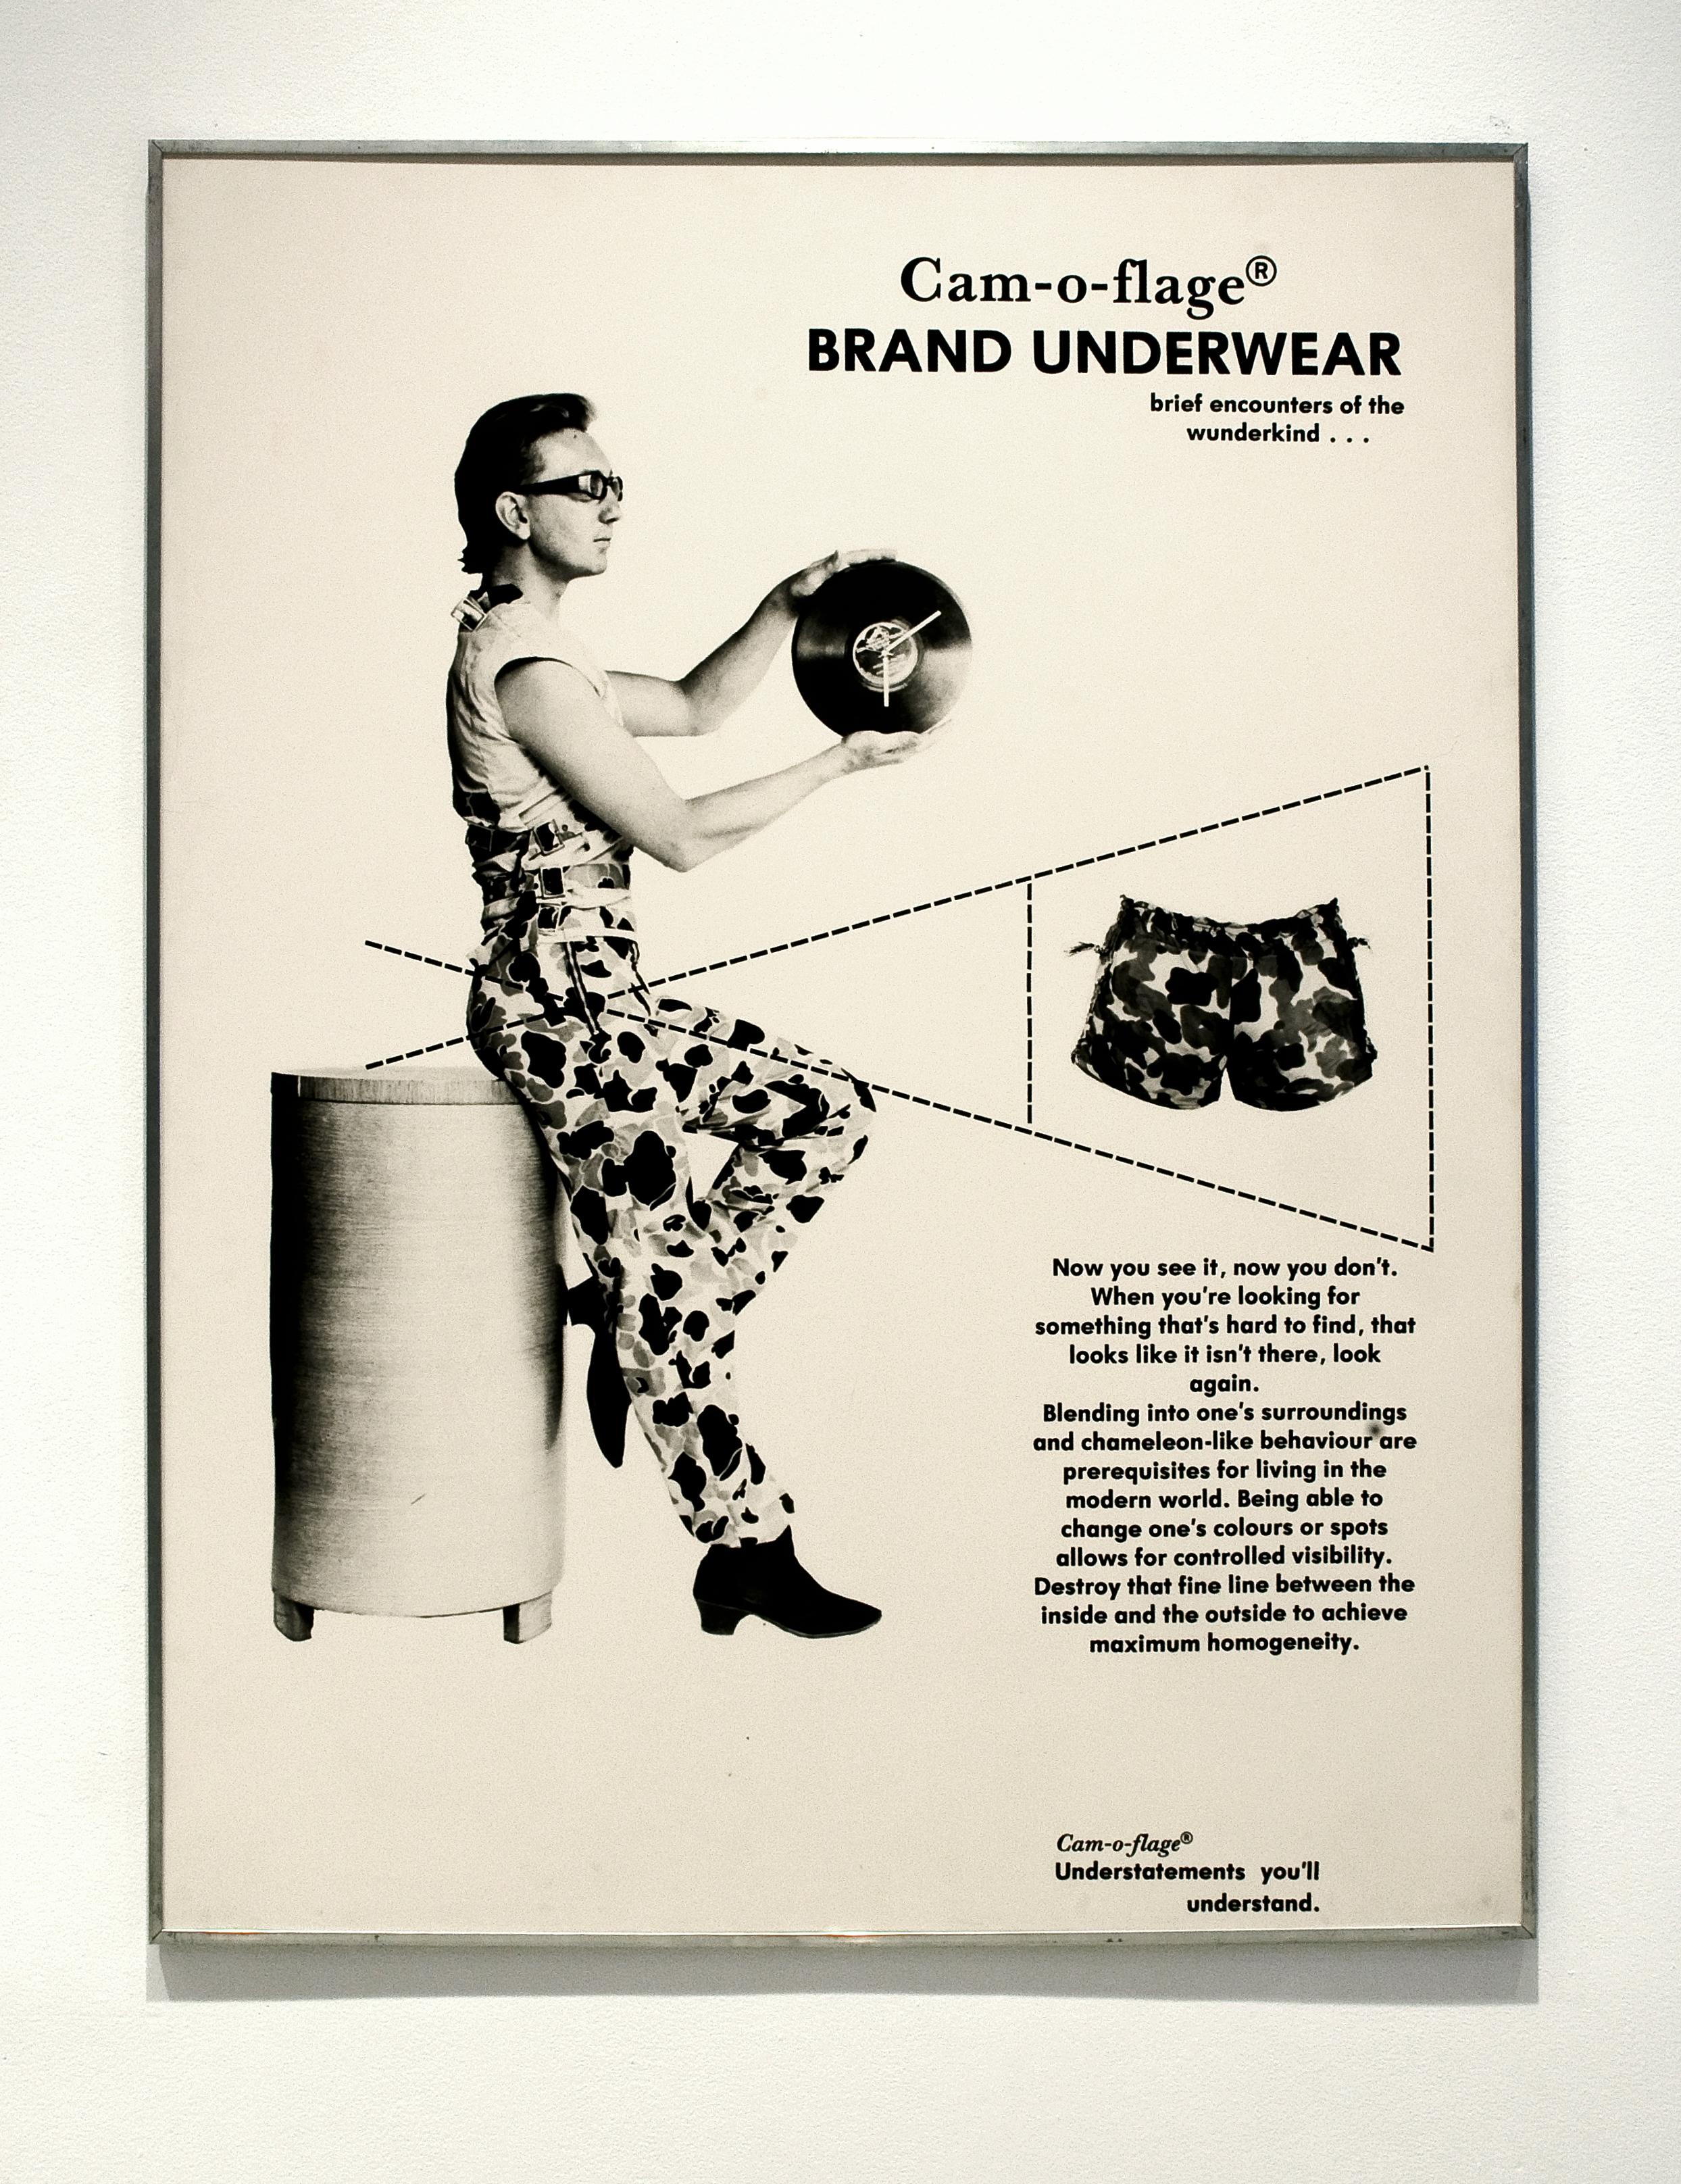 David Buchan,   Modern Fashions Suite:     Cam-o-flage Brand Underwear  , 1977.   Collection University of Lethbridge Art Gallery.